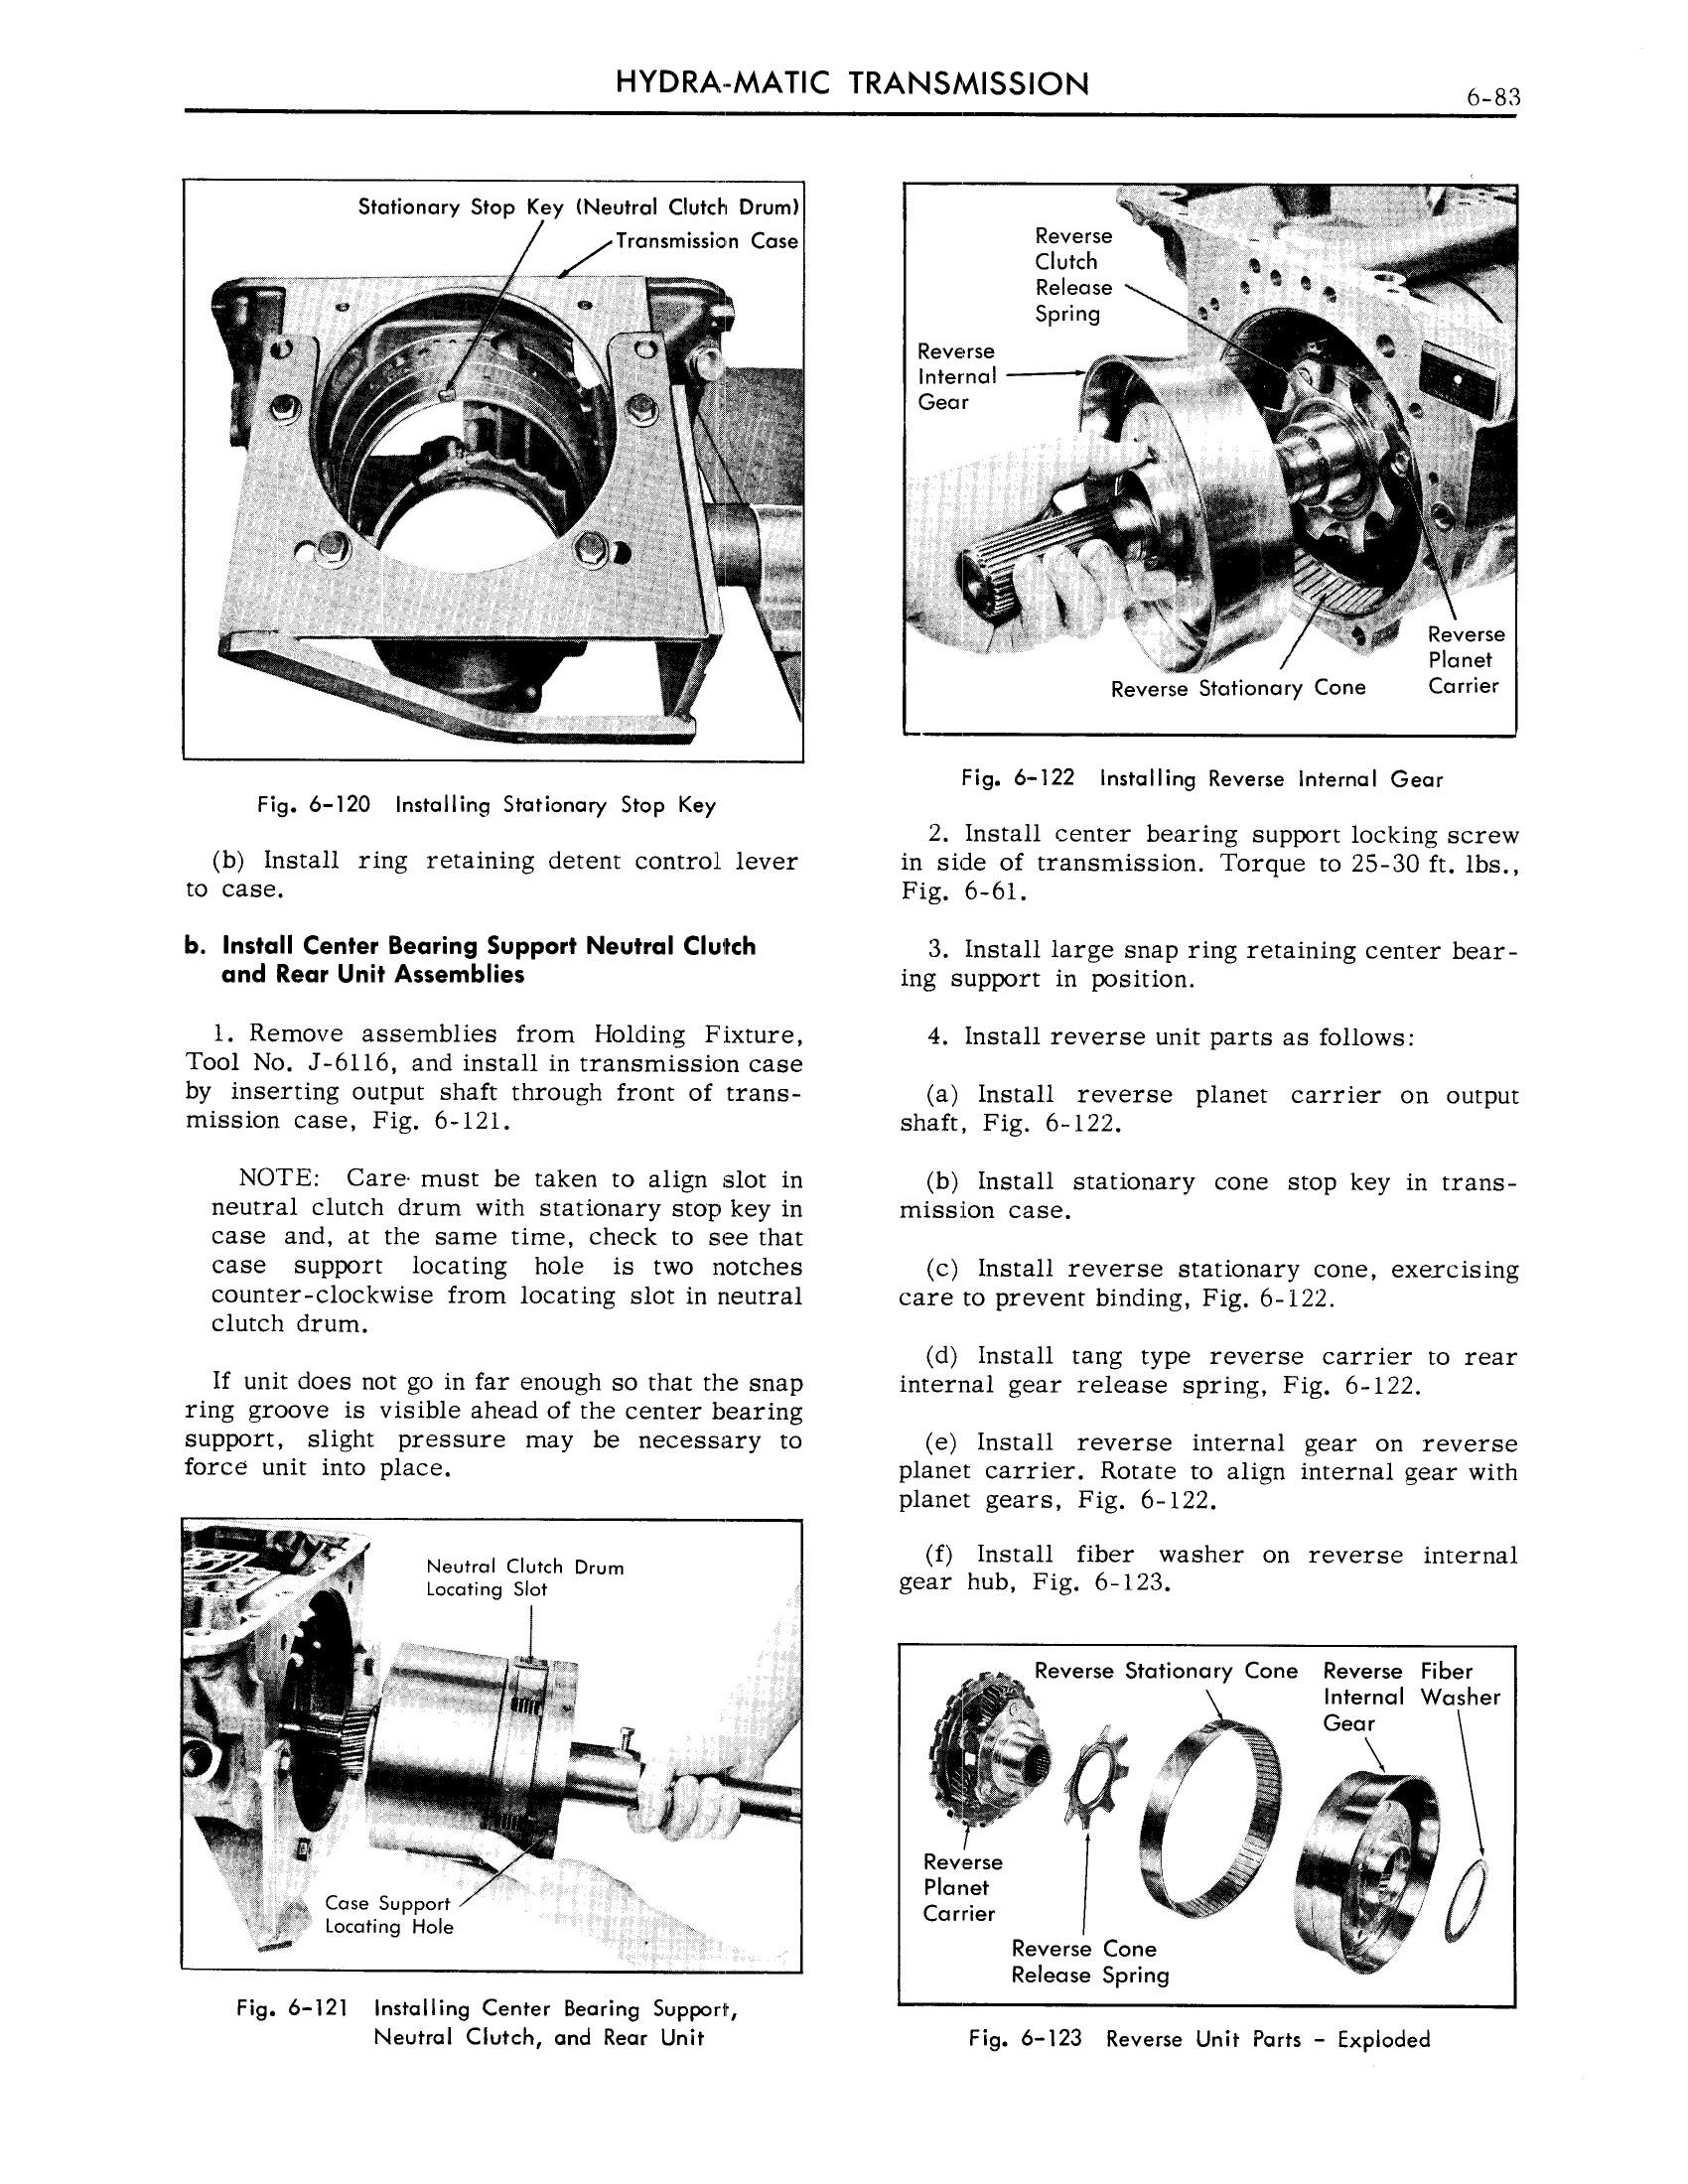 1959 Cadillac Shop Manual- Hydra-Matic Page 83 of 89